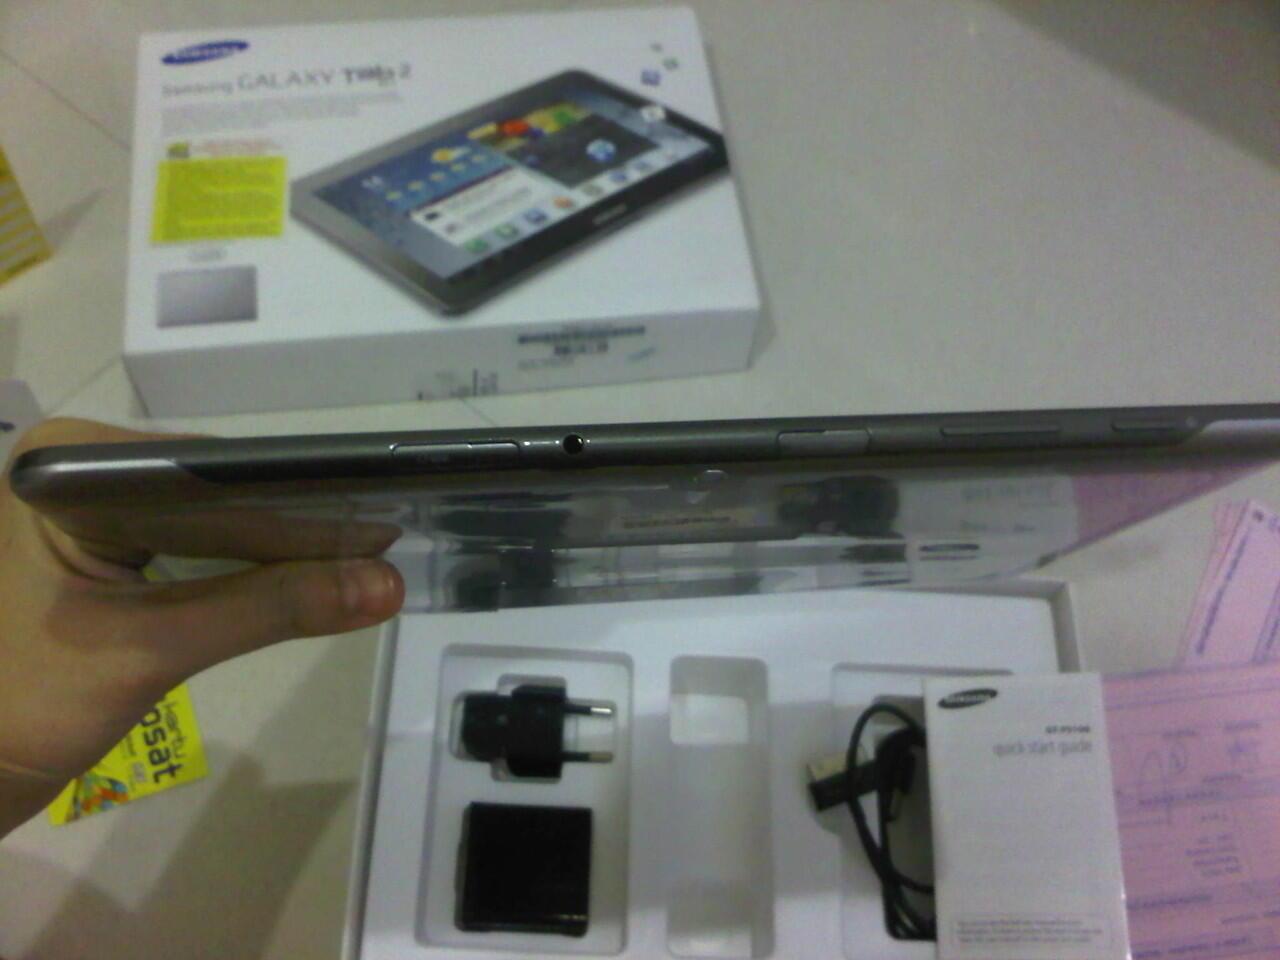 Samsung Galaxy Tab 2 10.1 P5100 2nd